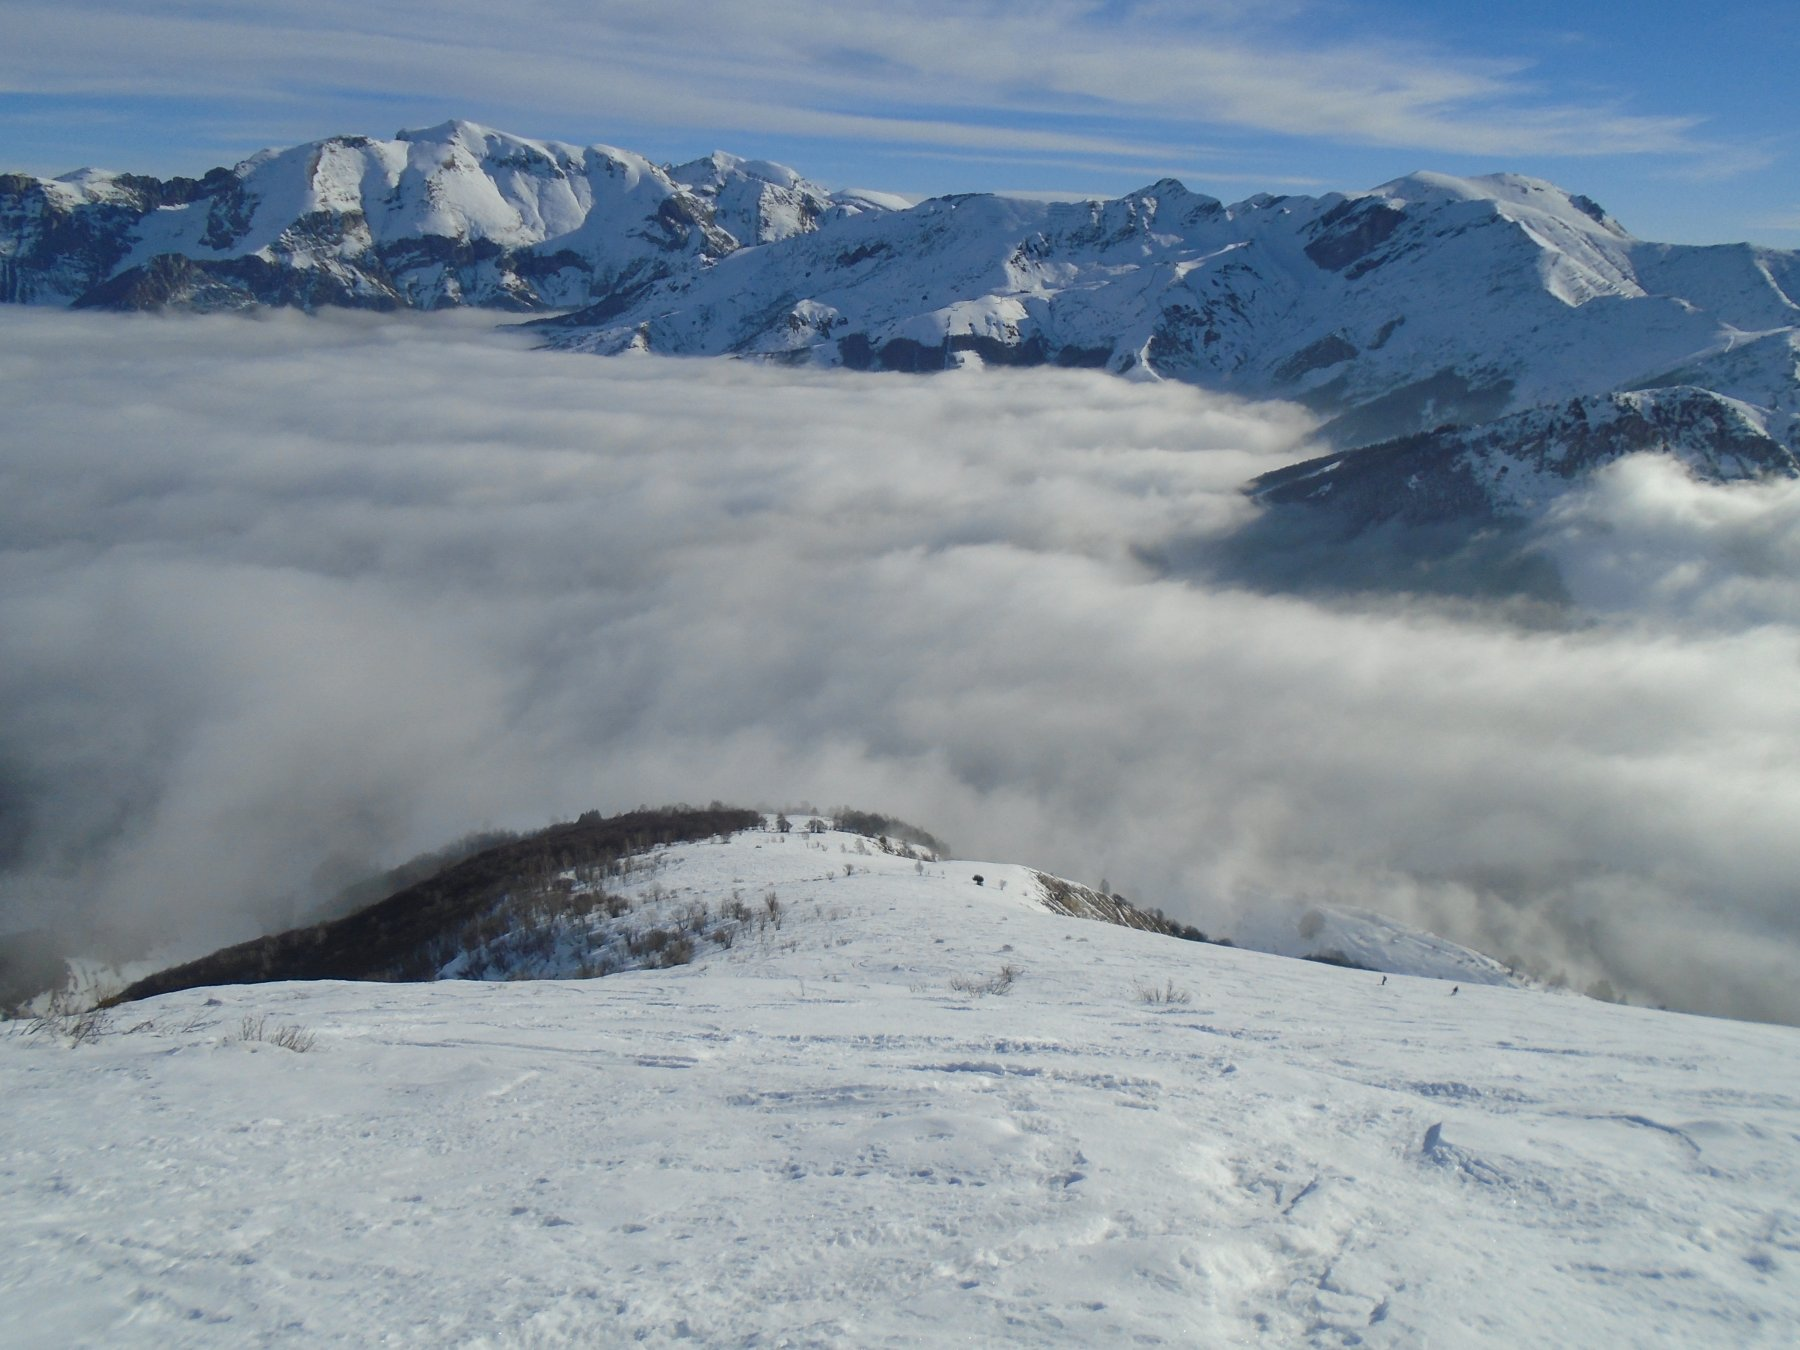 Discesa: la nebbia va dissolvendosi